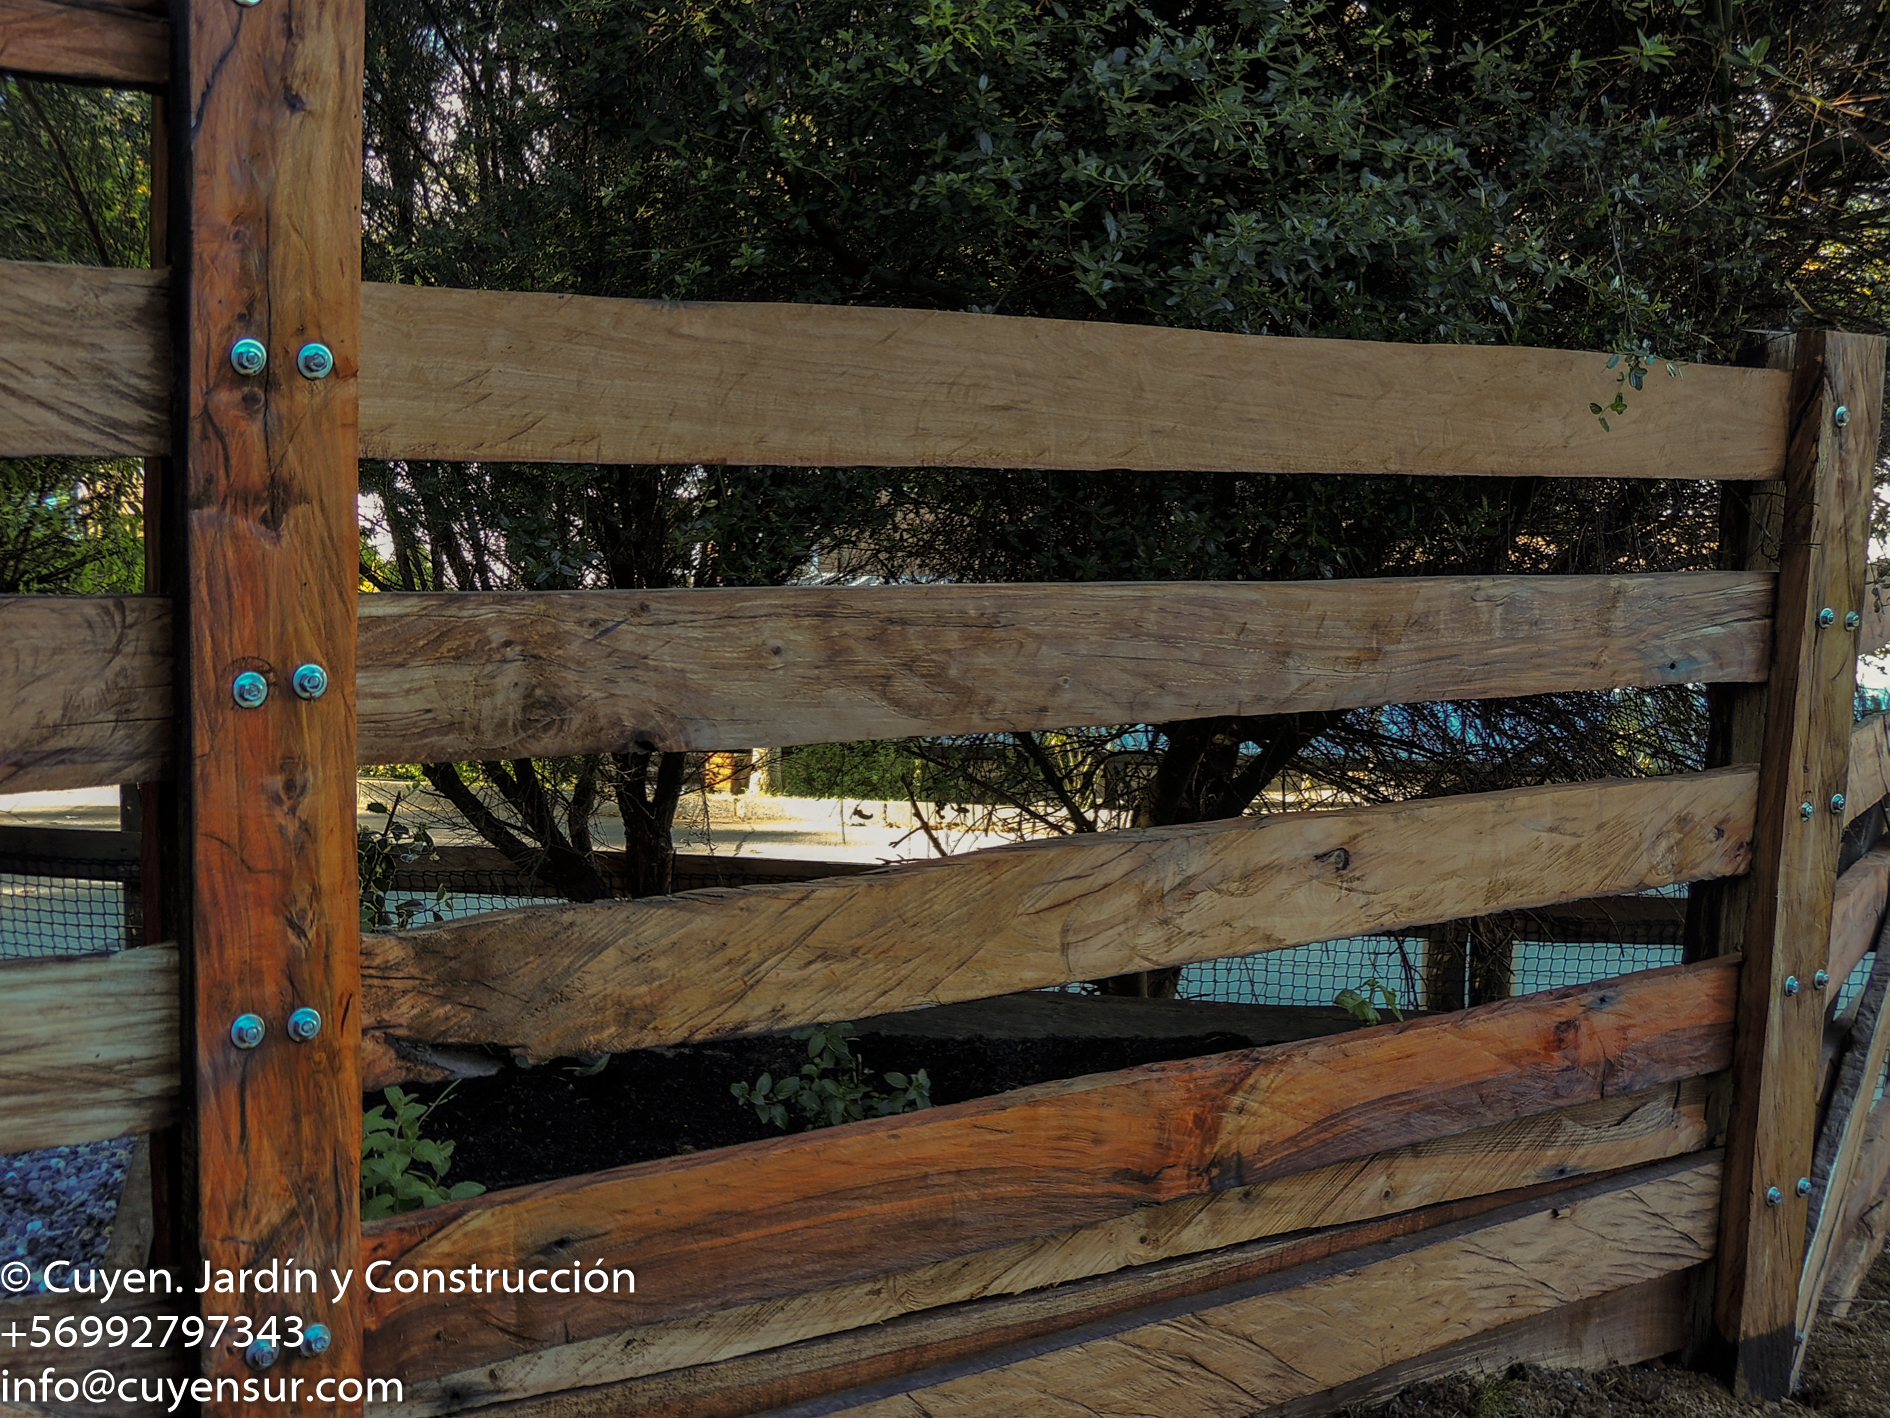 #patagonia_#surdechile_#lagoranco_#jardín_#paisajismo_#diseño_#futrono_#cuencadelranco-7